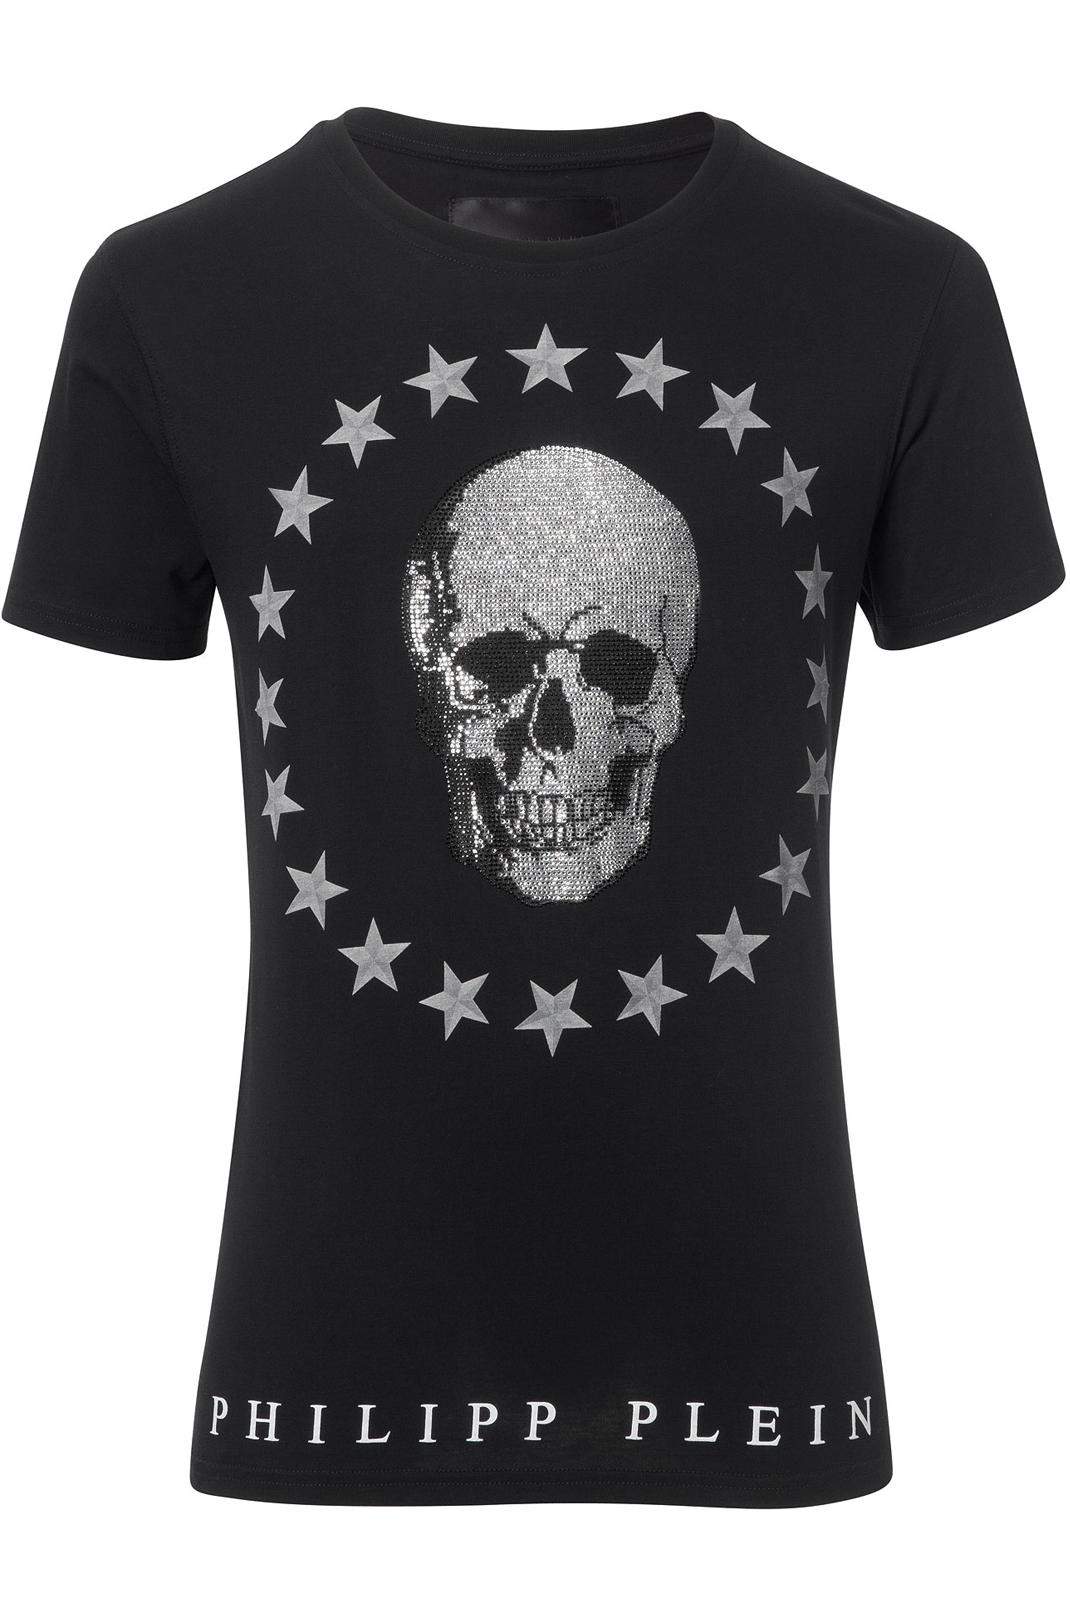 Tee-shirts  Philipp plein HM341068 COLEMAN 02 BLACK